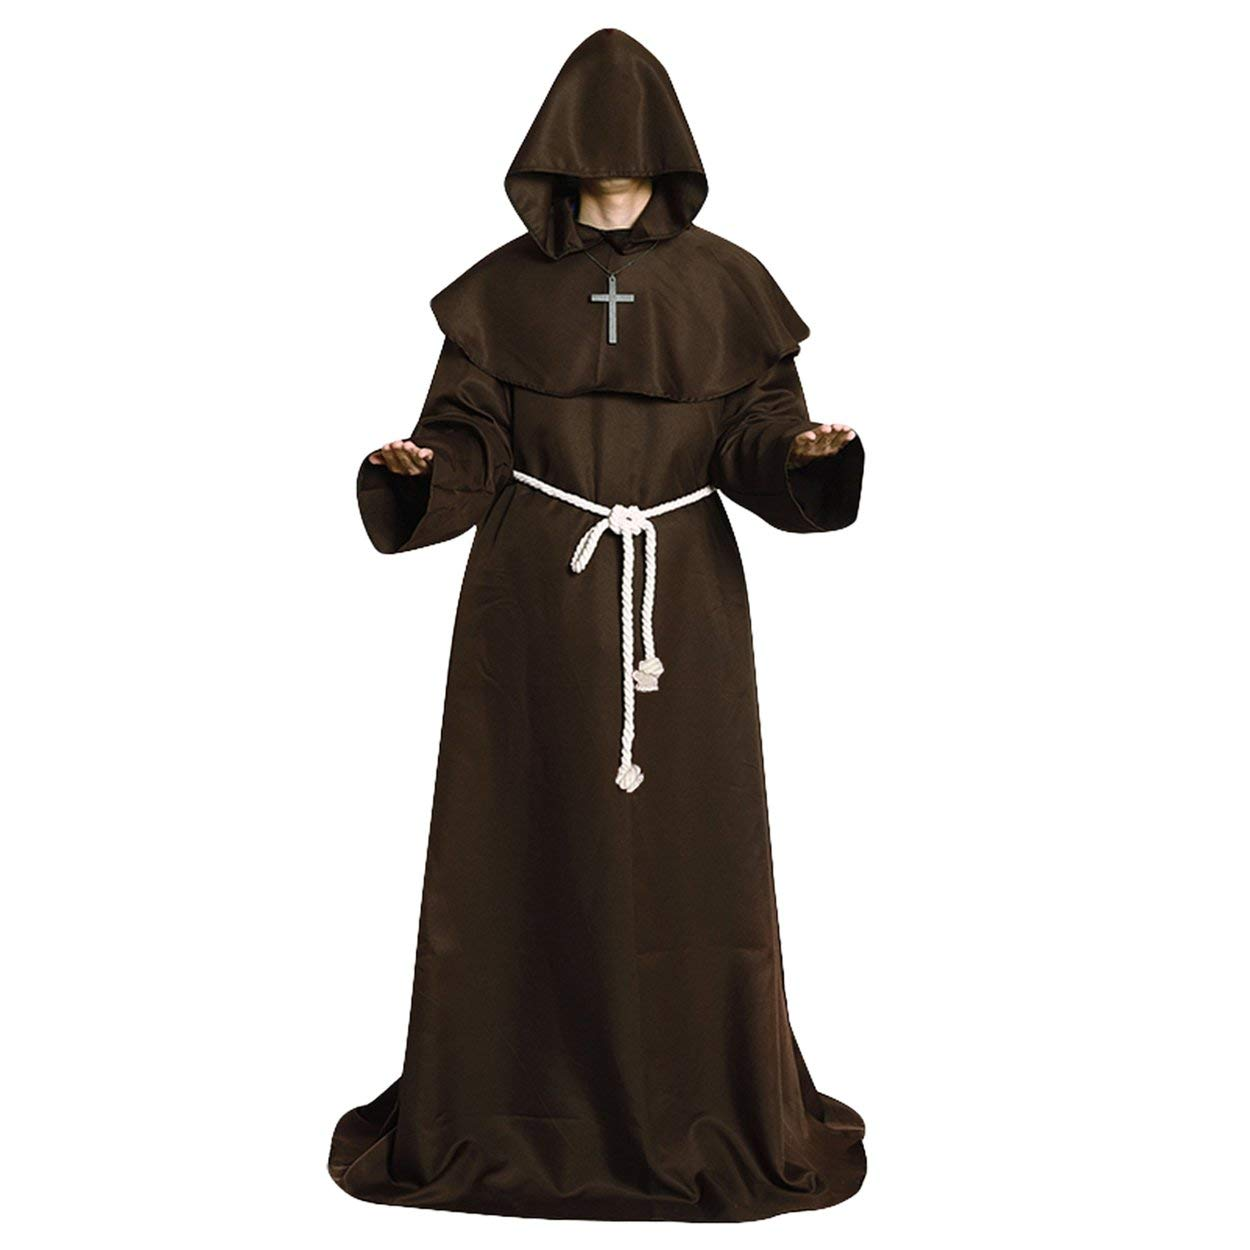 Bvnffghvbjgj Costume Cosplay di Halloween Medioevo Veste dei monaci Monaci Wizar